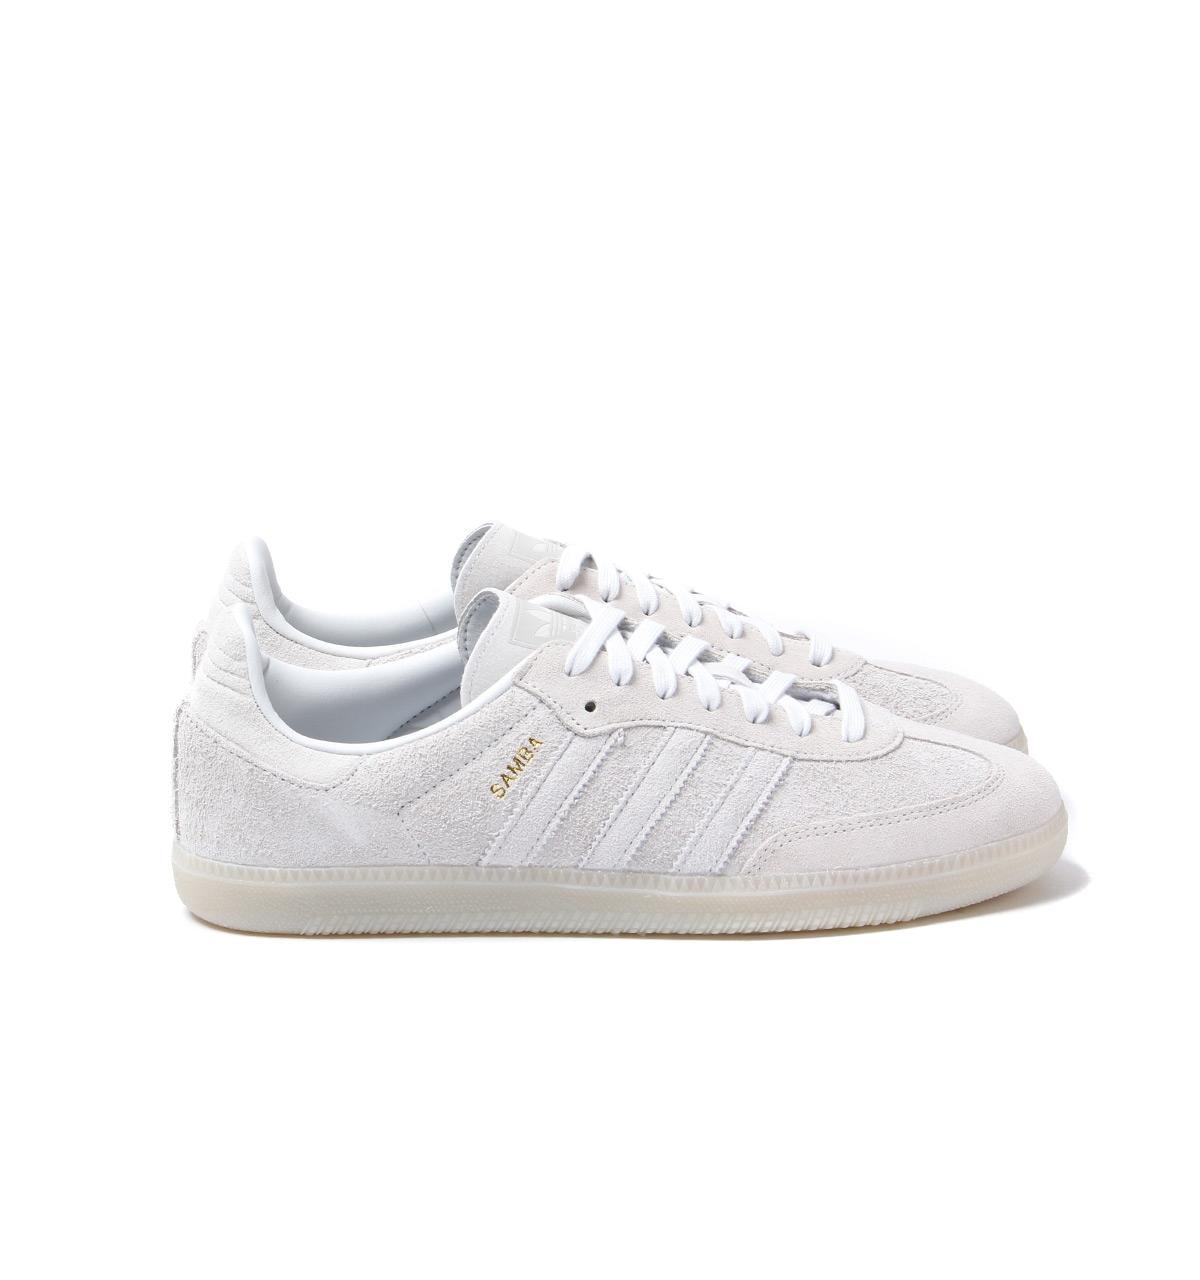 5e18c1b960c Adidas Originals - Adidas Samba Og Crystal White Trainers for Men - Lyst.  View fullscreen